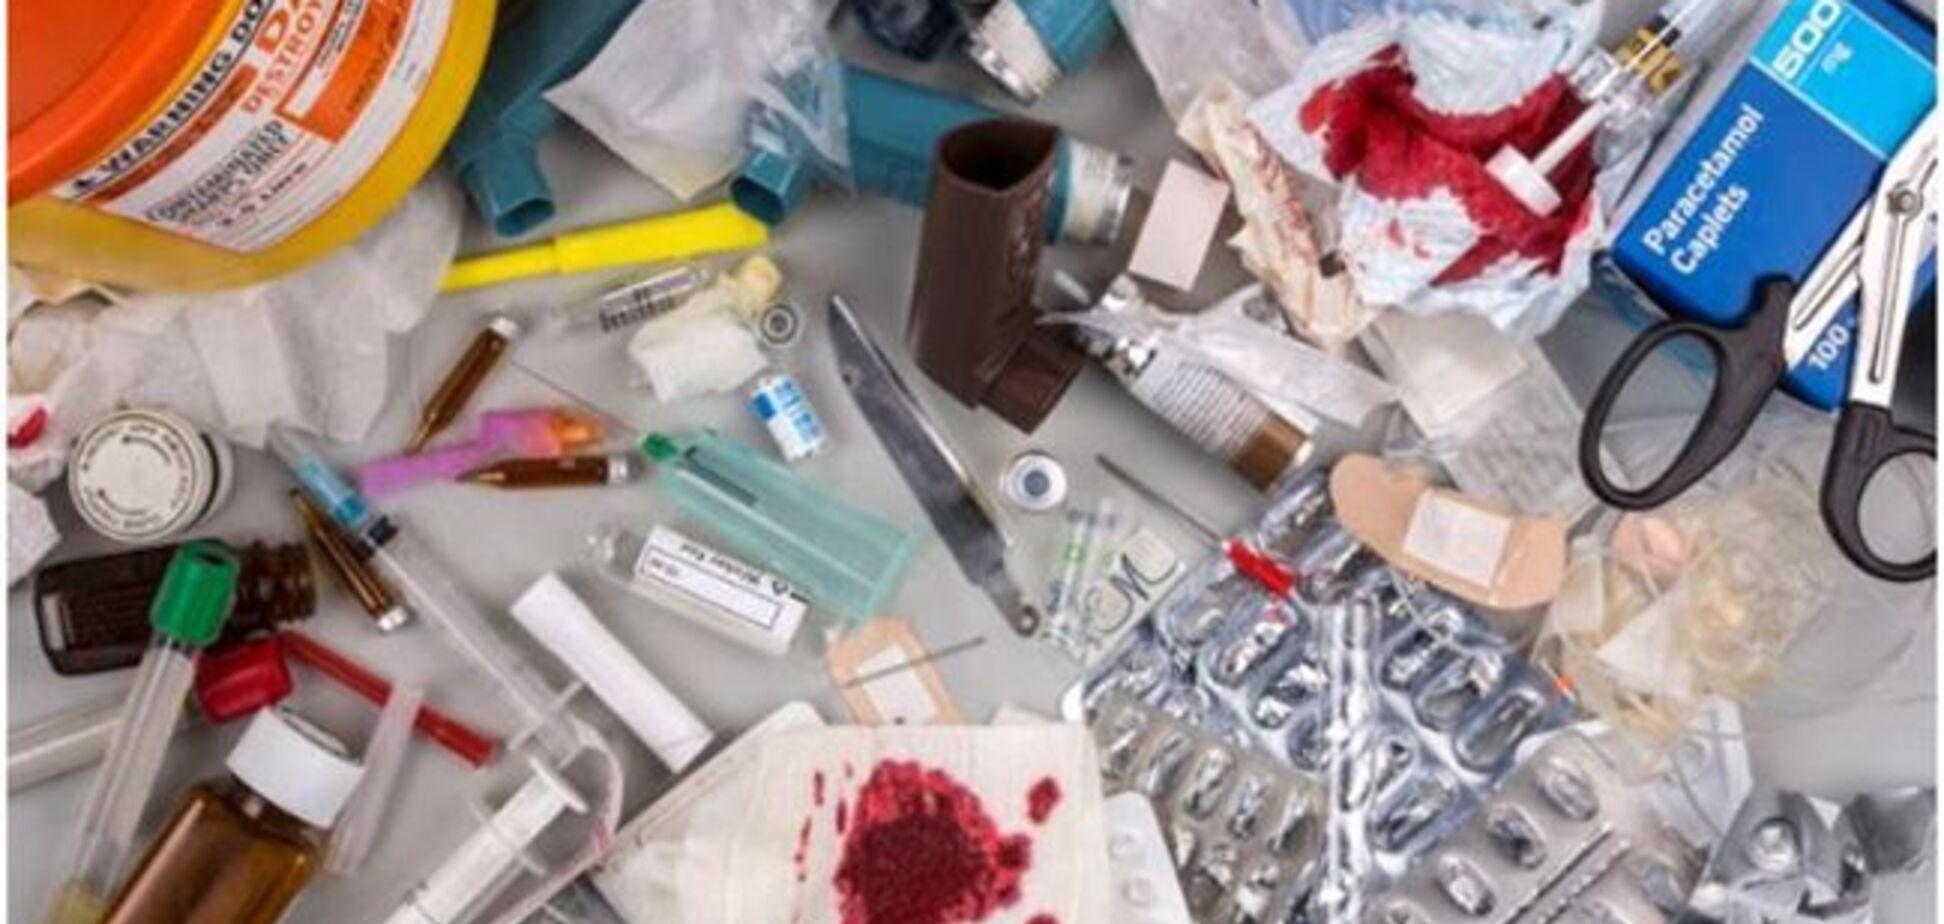 Шприци, катетери та гора сміття: в Дніпрі знайшли небезпечне звалище. Фото